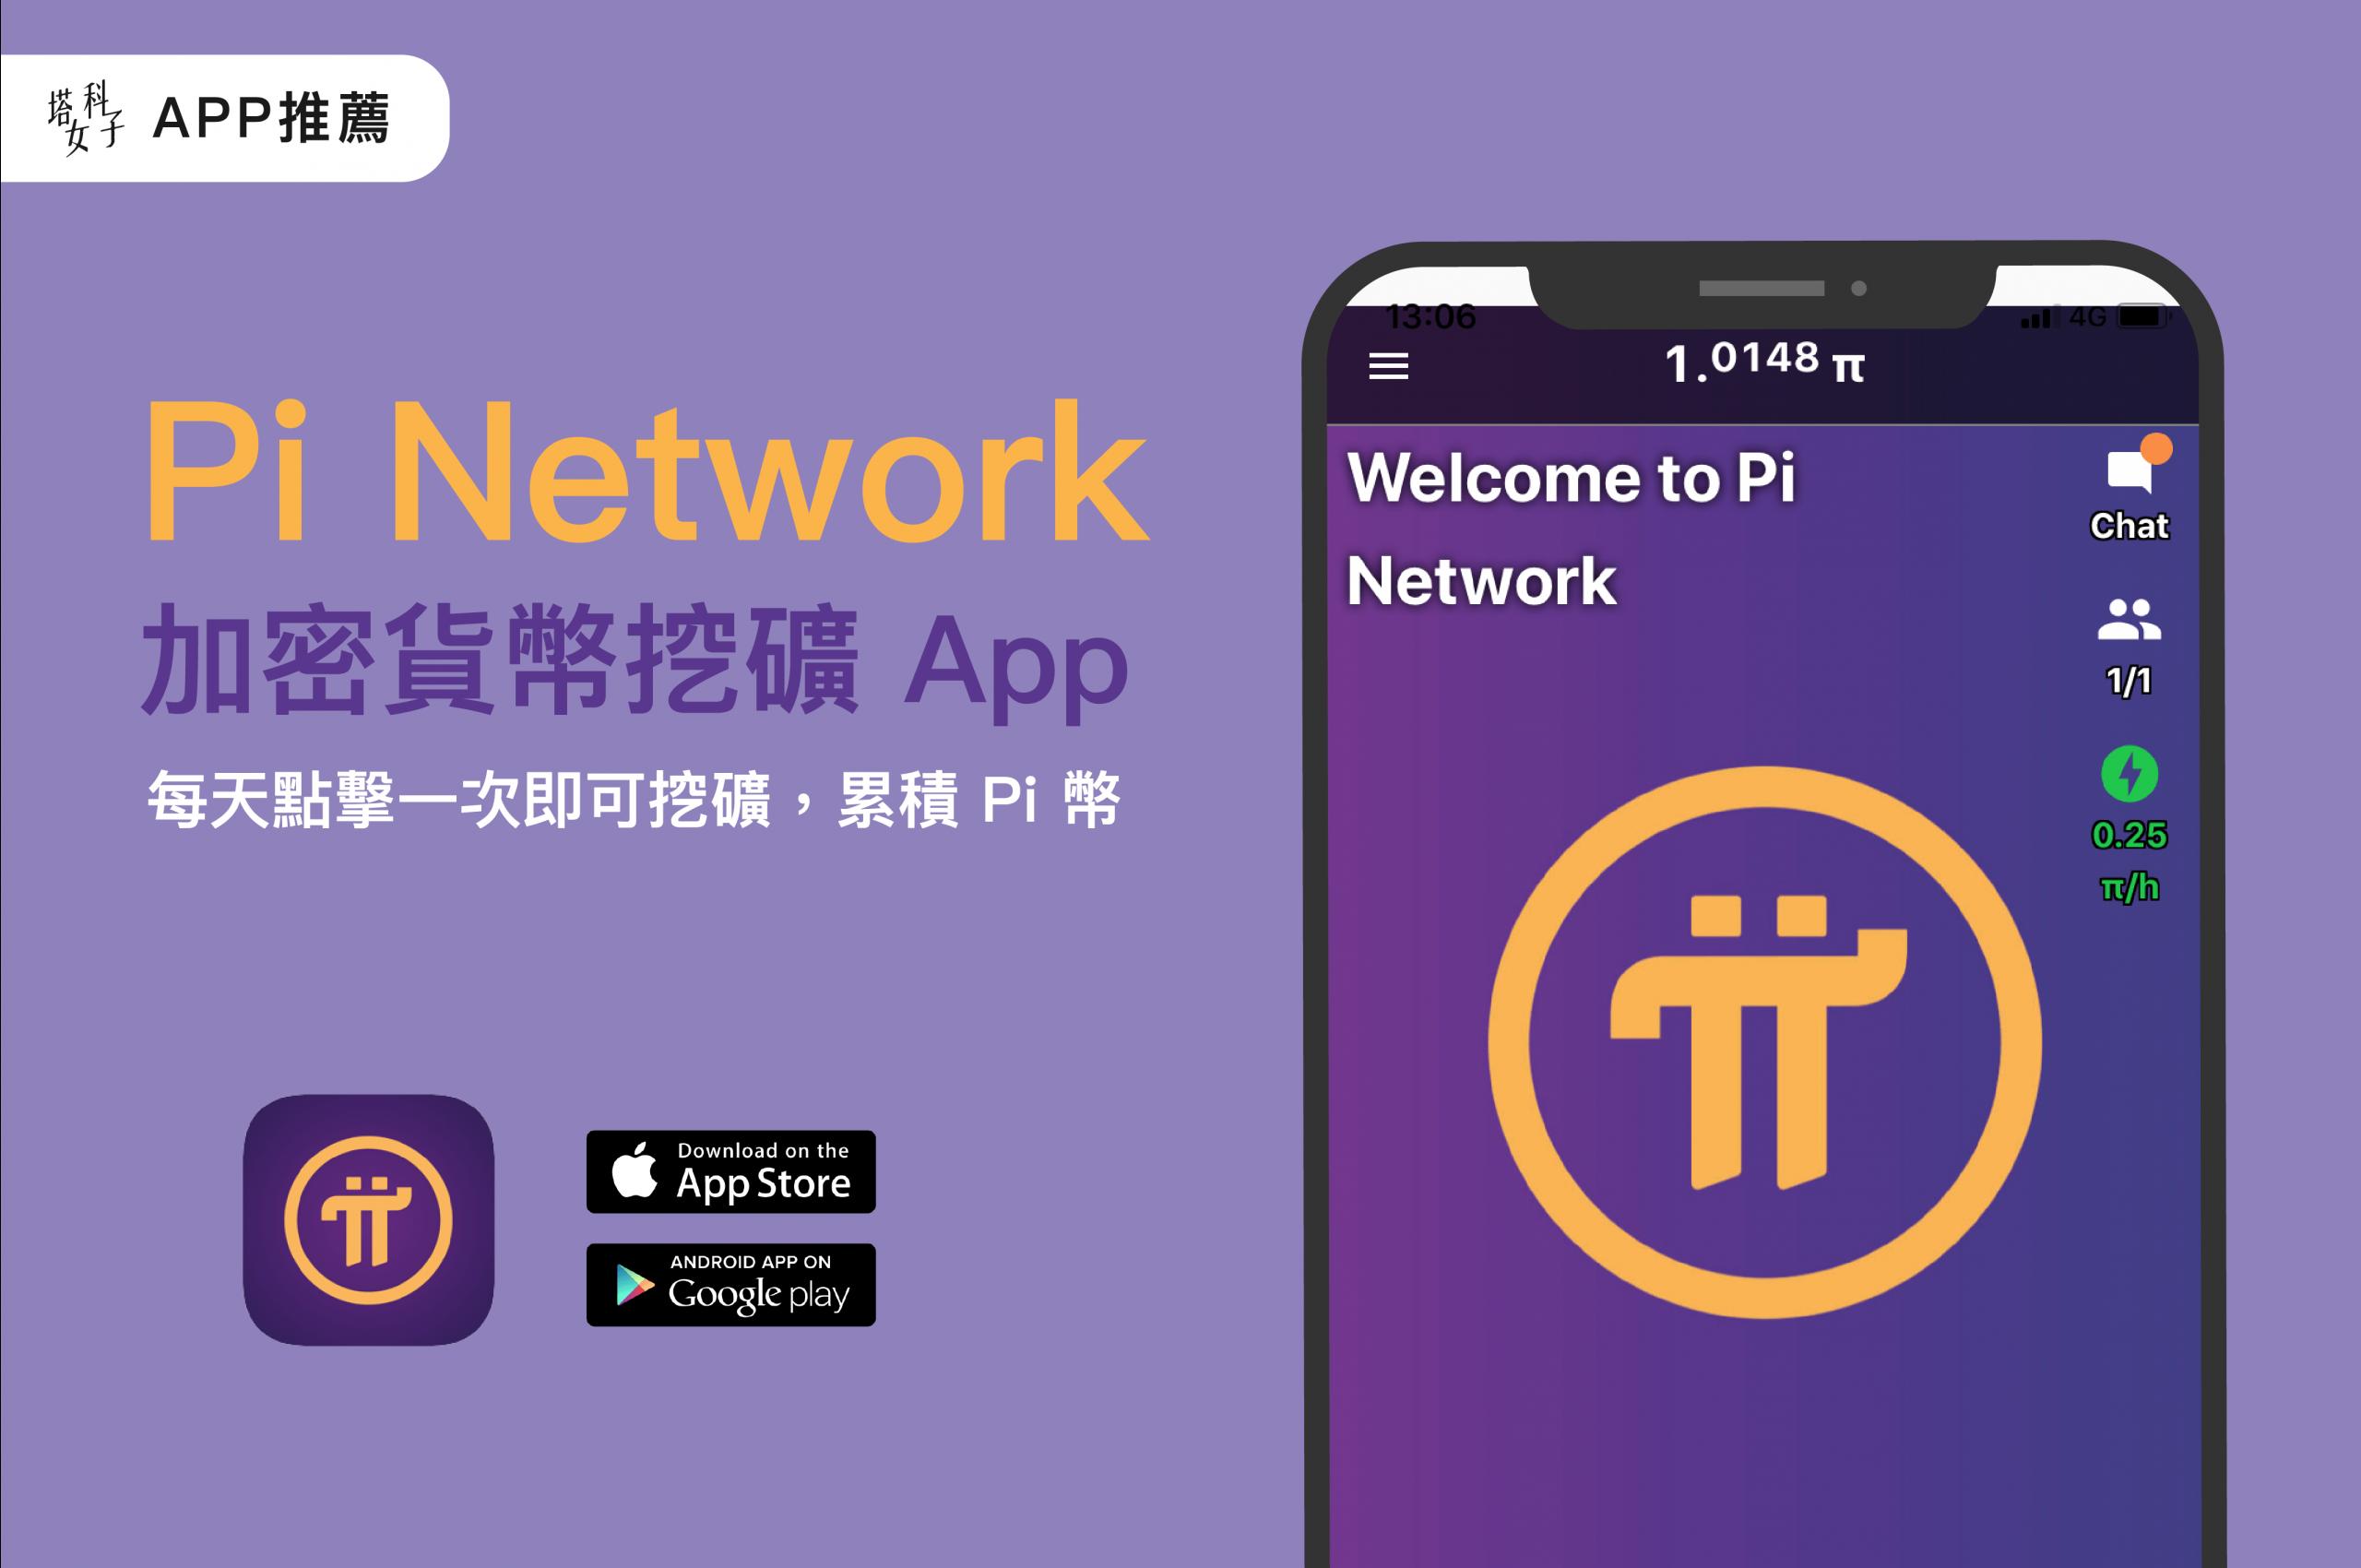 Pi Network 挖礦 APP,使用手機挖礦累積 Pi 幣